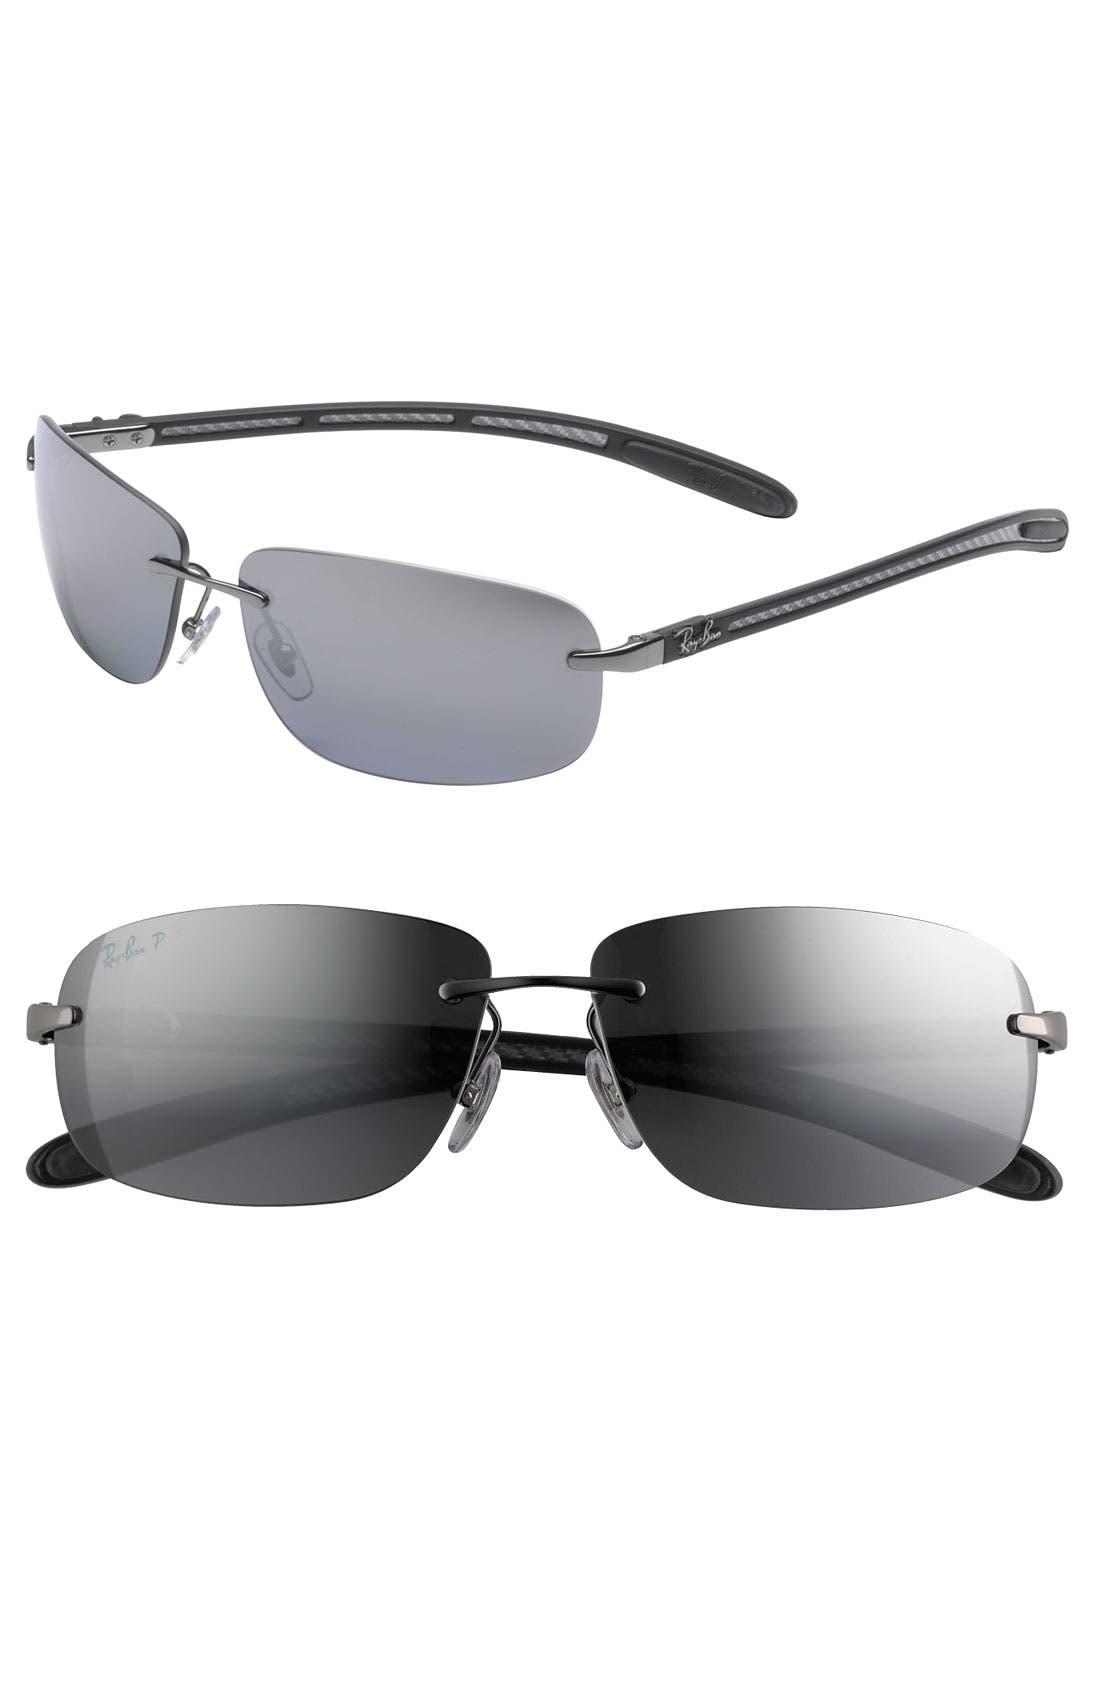 Main Image - Ray-Ban 'Tech' Rimless 61mm Sunglasses